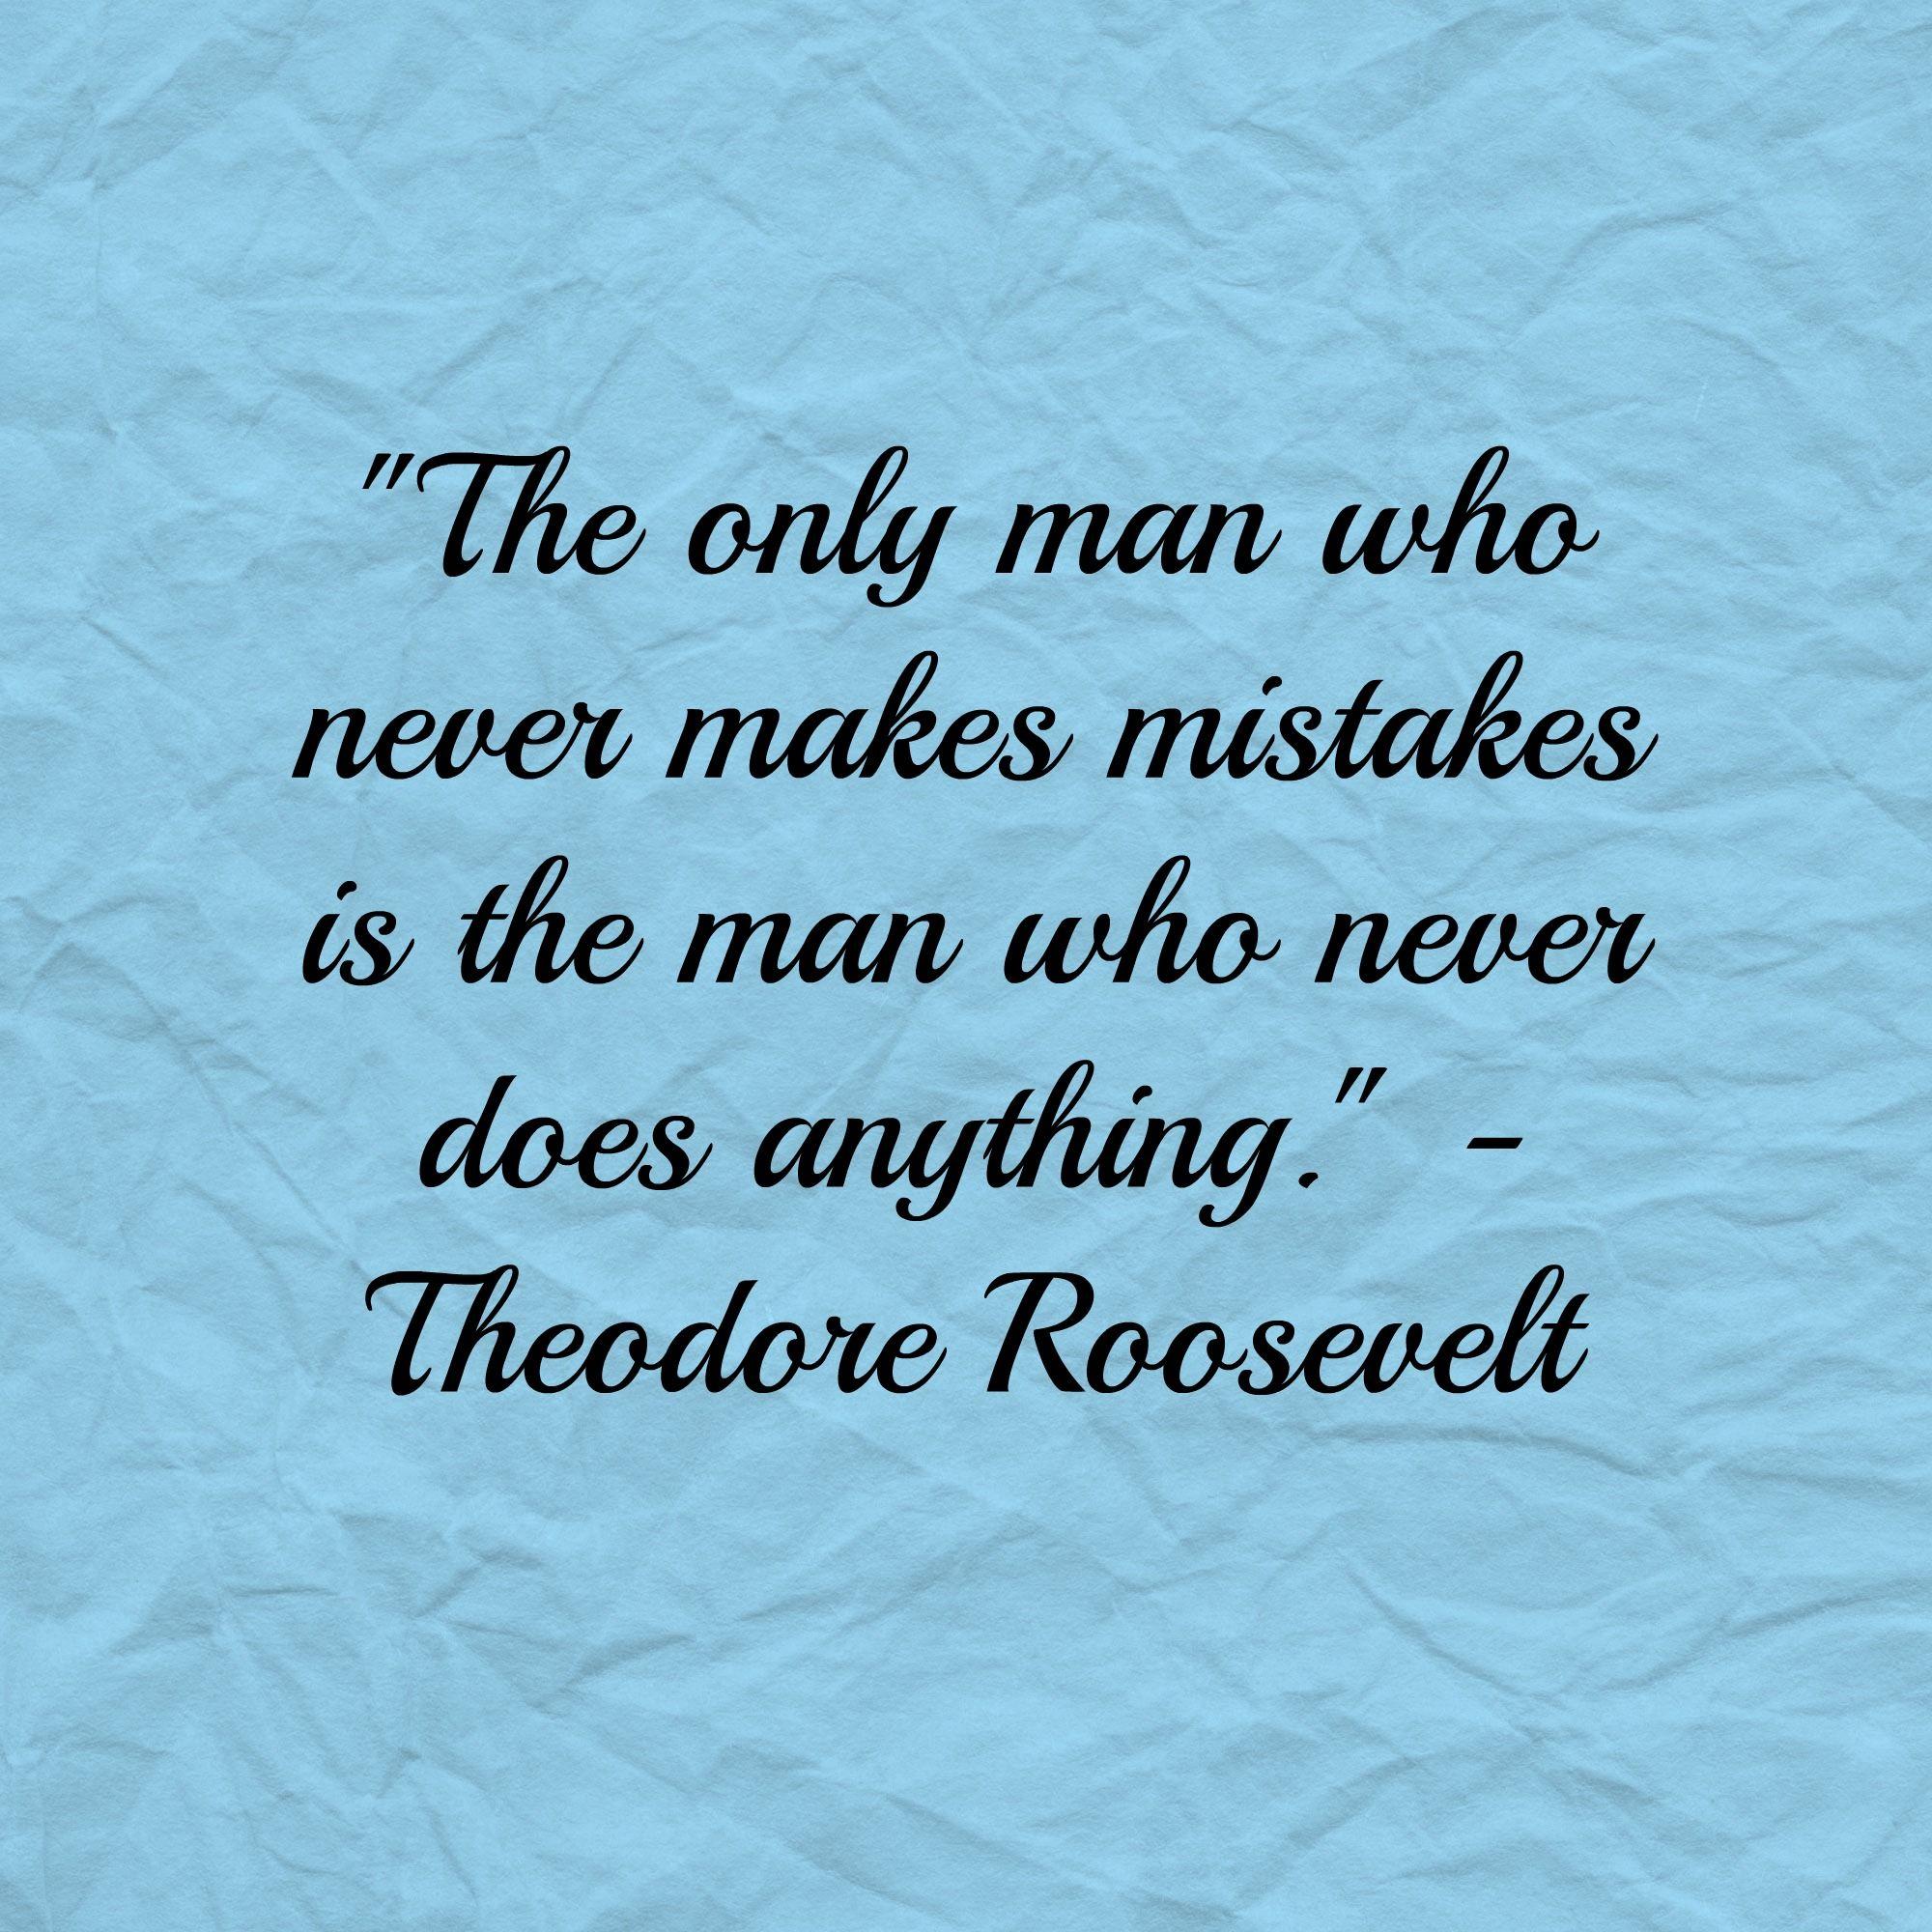 Theodore Roosevelt Quotes Theodore Roosevelt Quoteteddy Roosevelt Quotemotivational